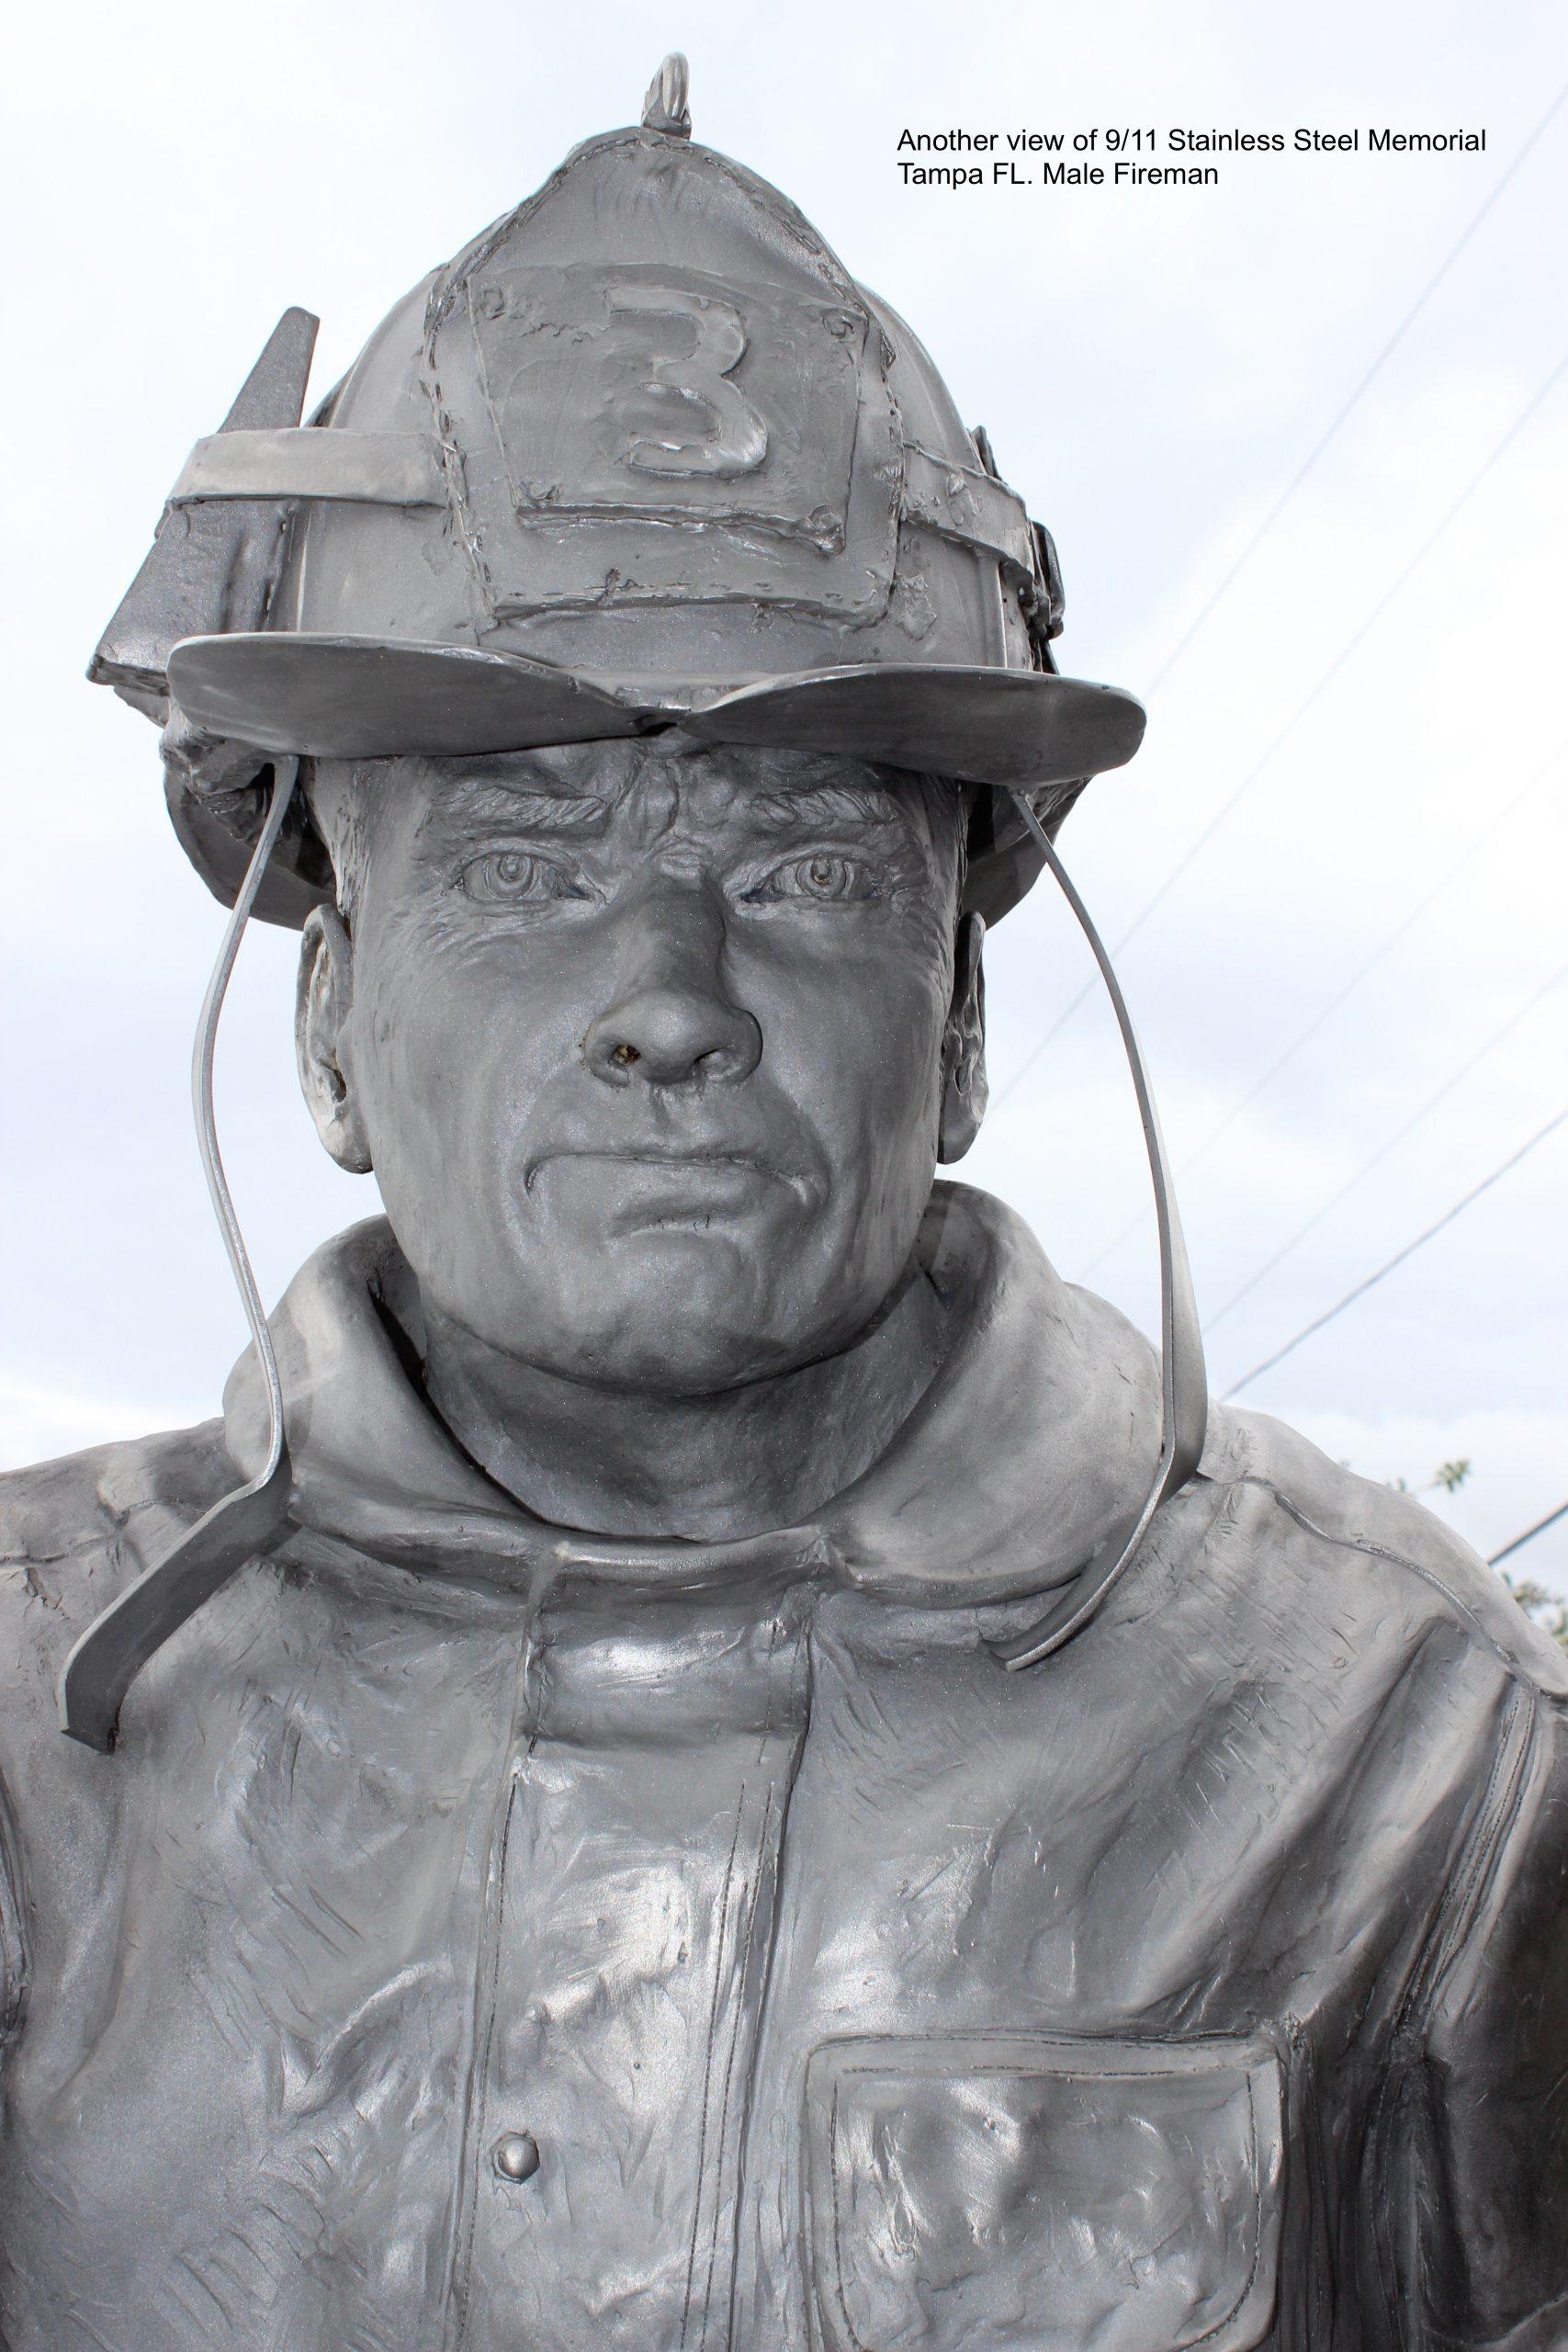 Fearless Champions (9/11 Memorial)